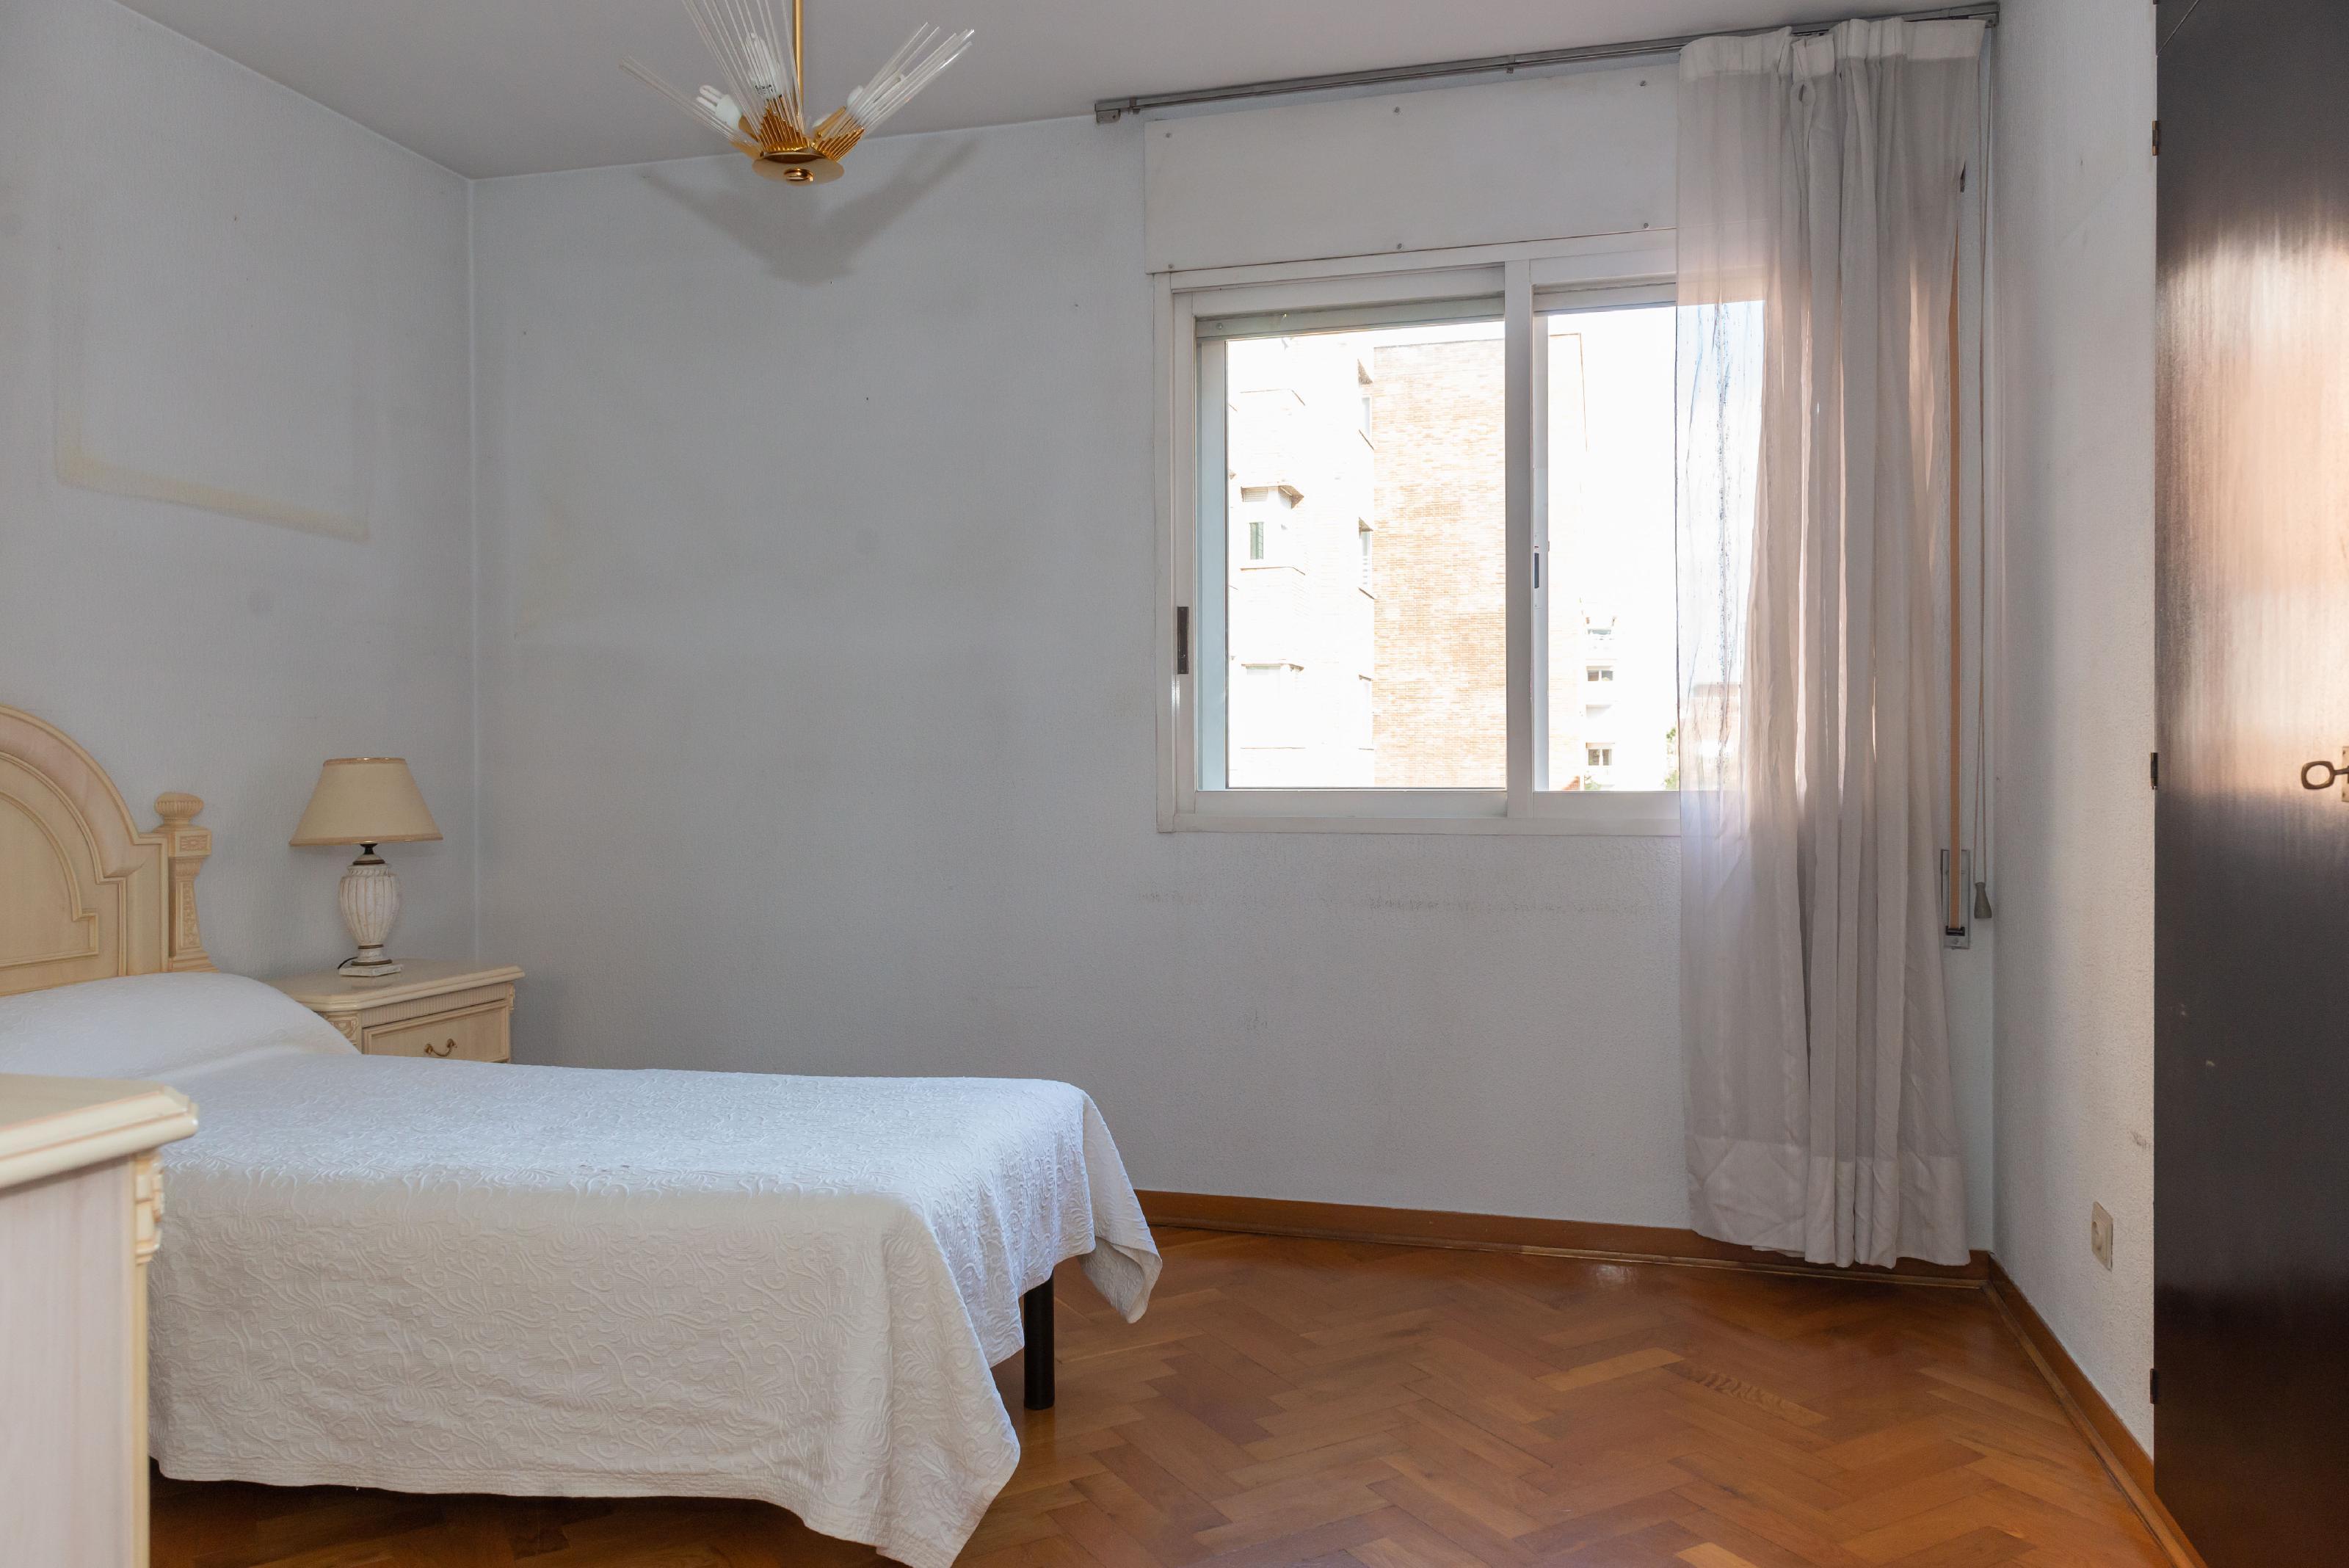 253899 Flat for sale in Sarrià-Sant Gervasi, Sant Gervasi-Galvany 28